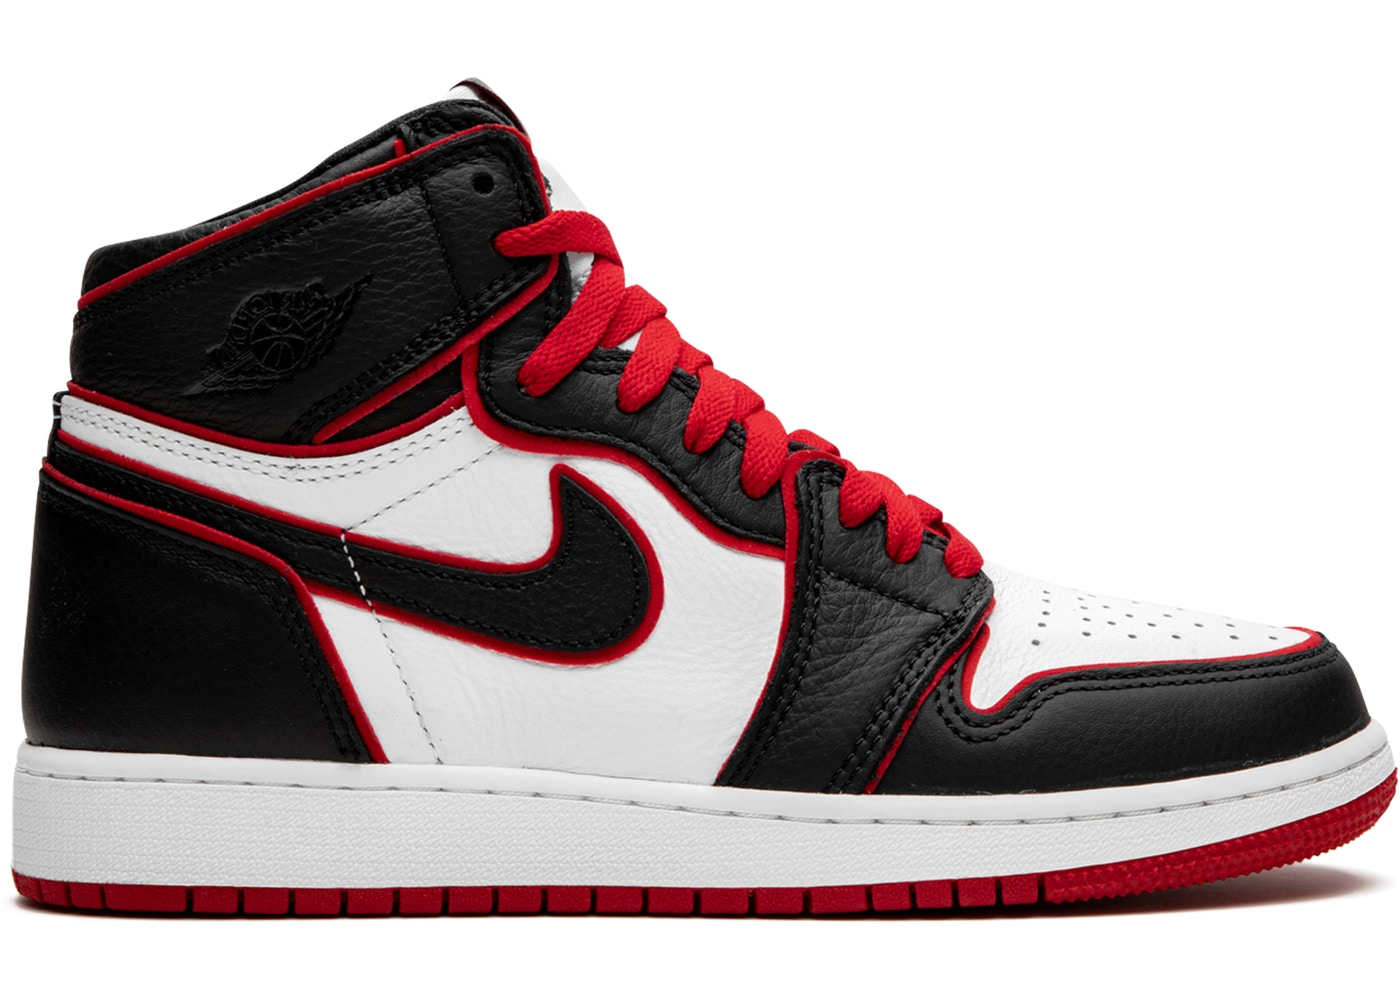 Jordan 1 Retro High Bloodline (GS)